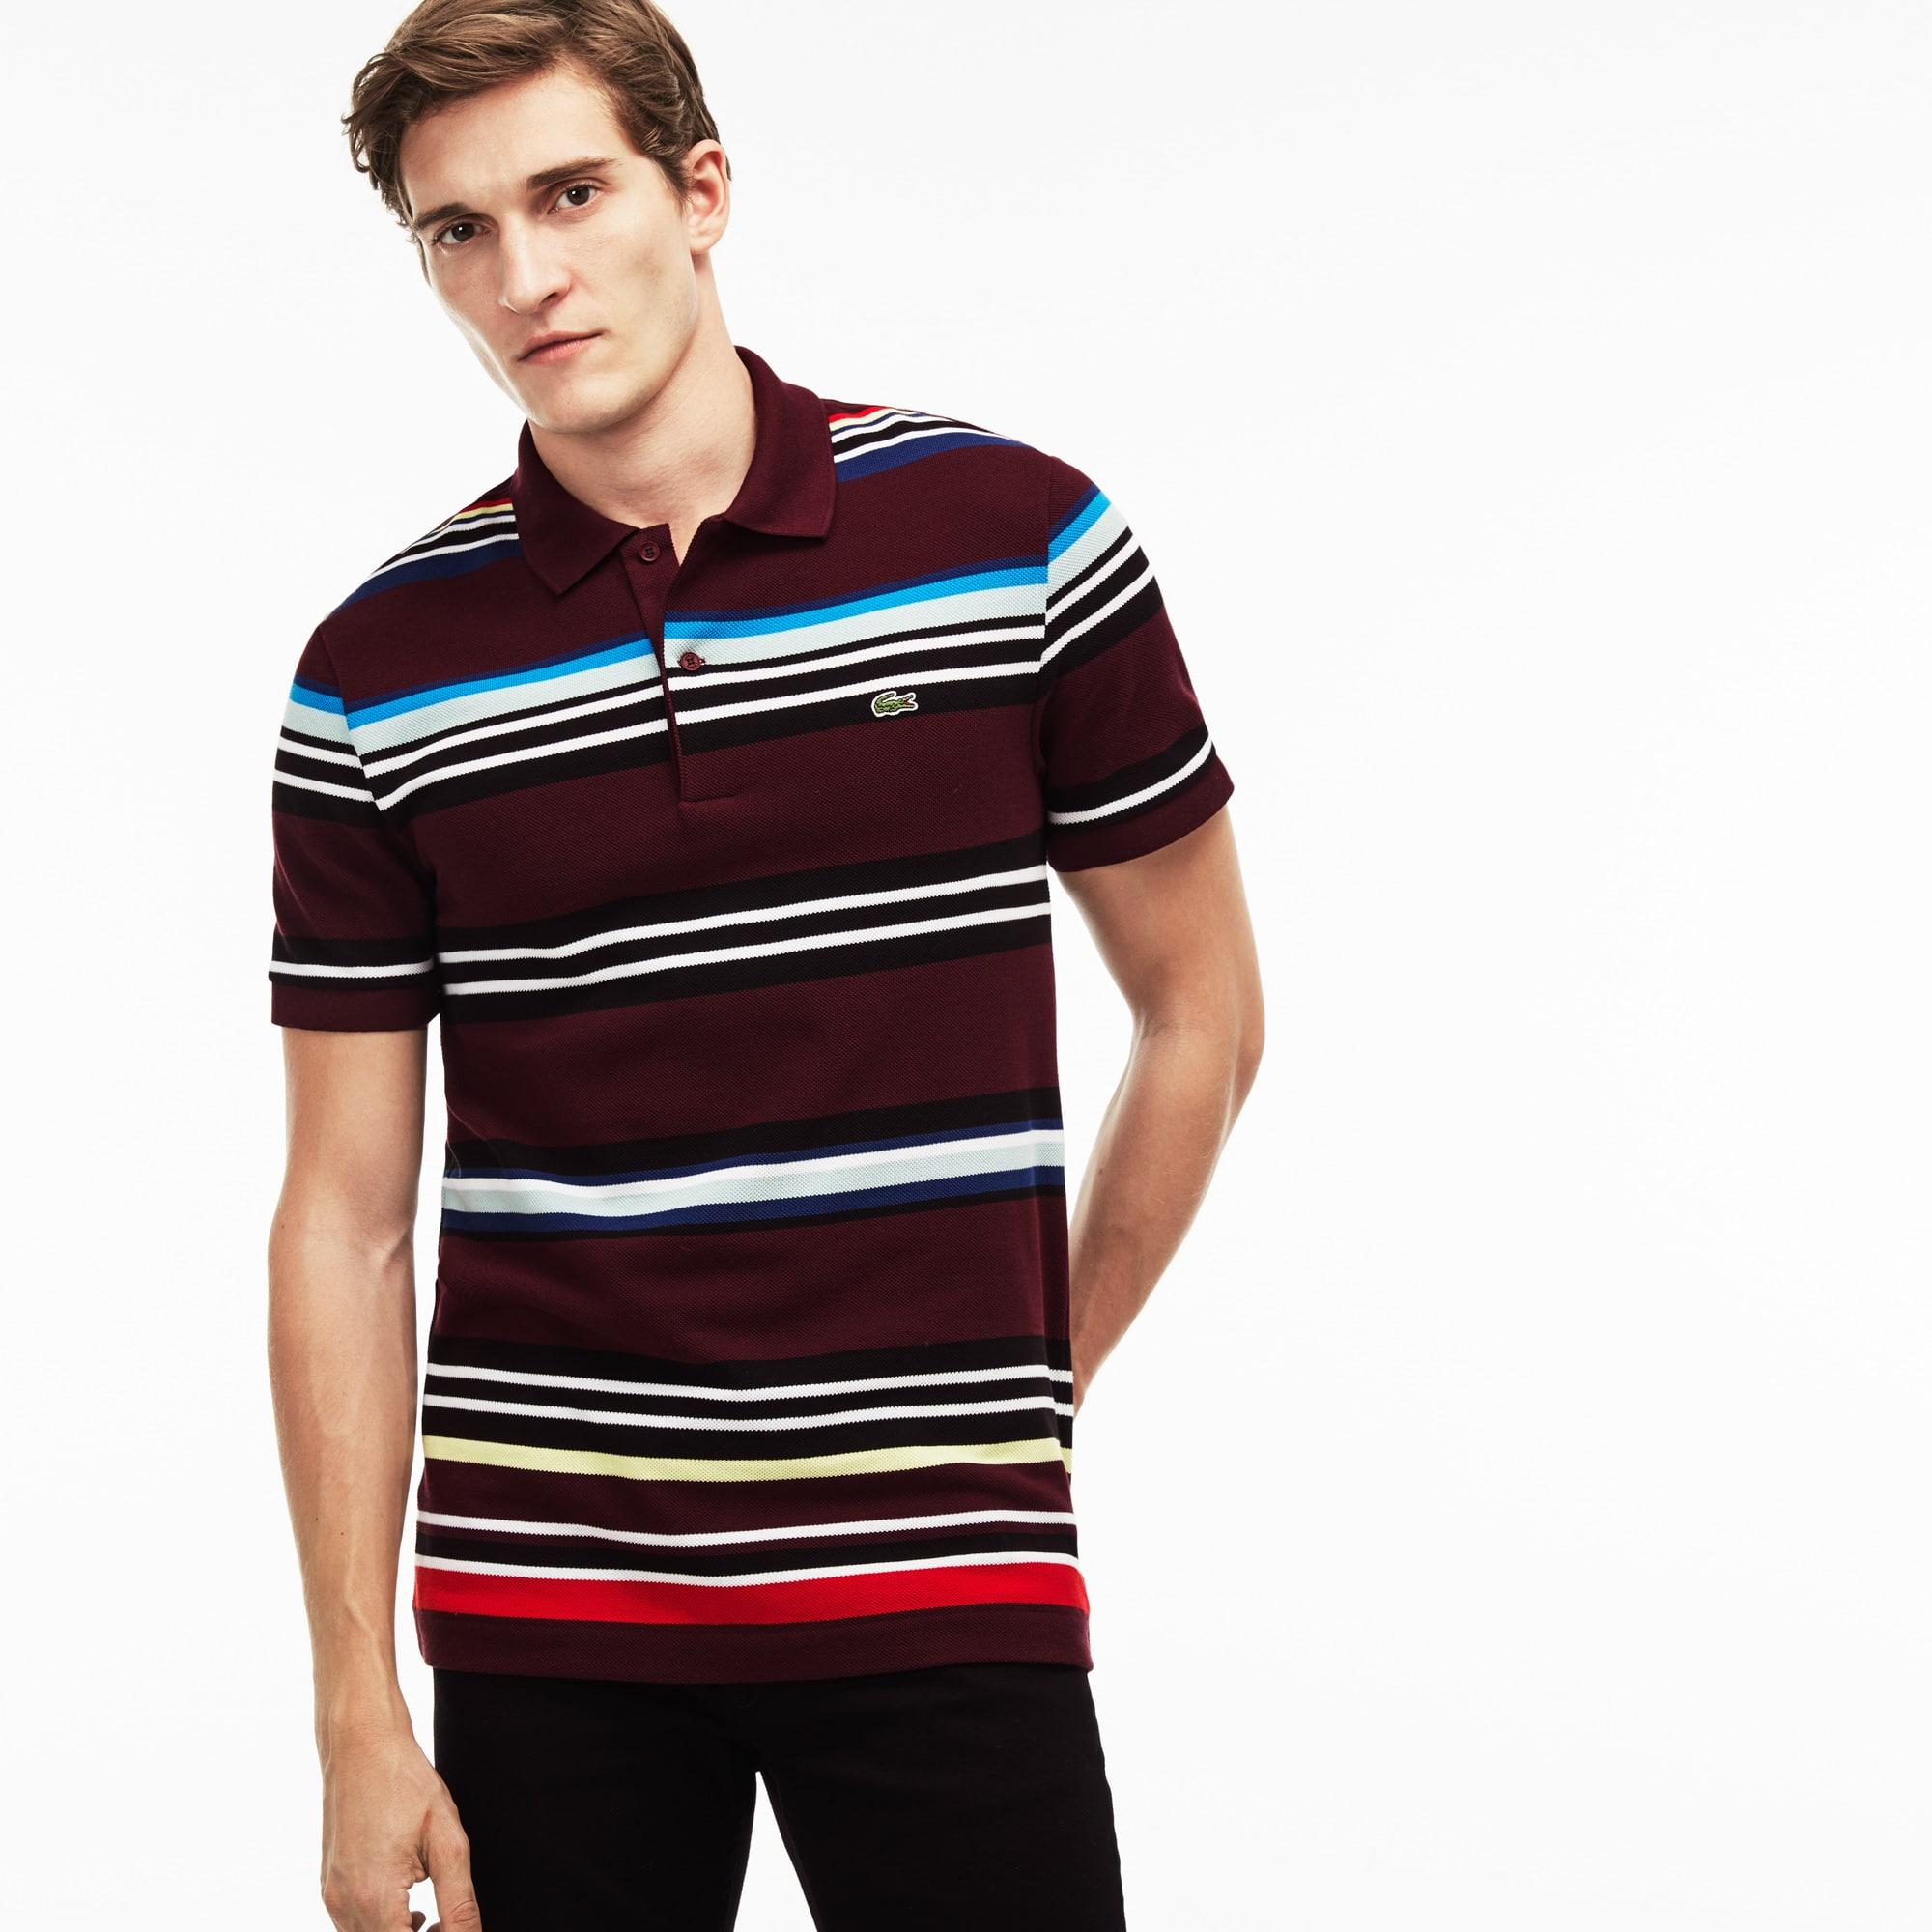 654c0870b Men's Lacoste Regular Fit Flecked Colored Stripe Piqué Polo Shirt ...